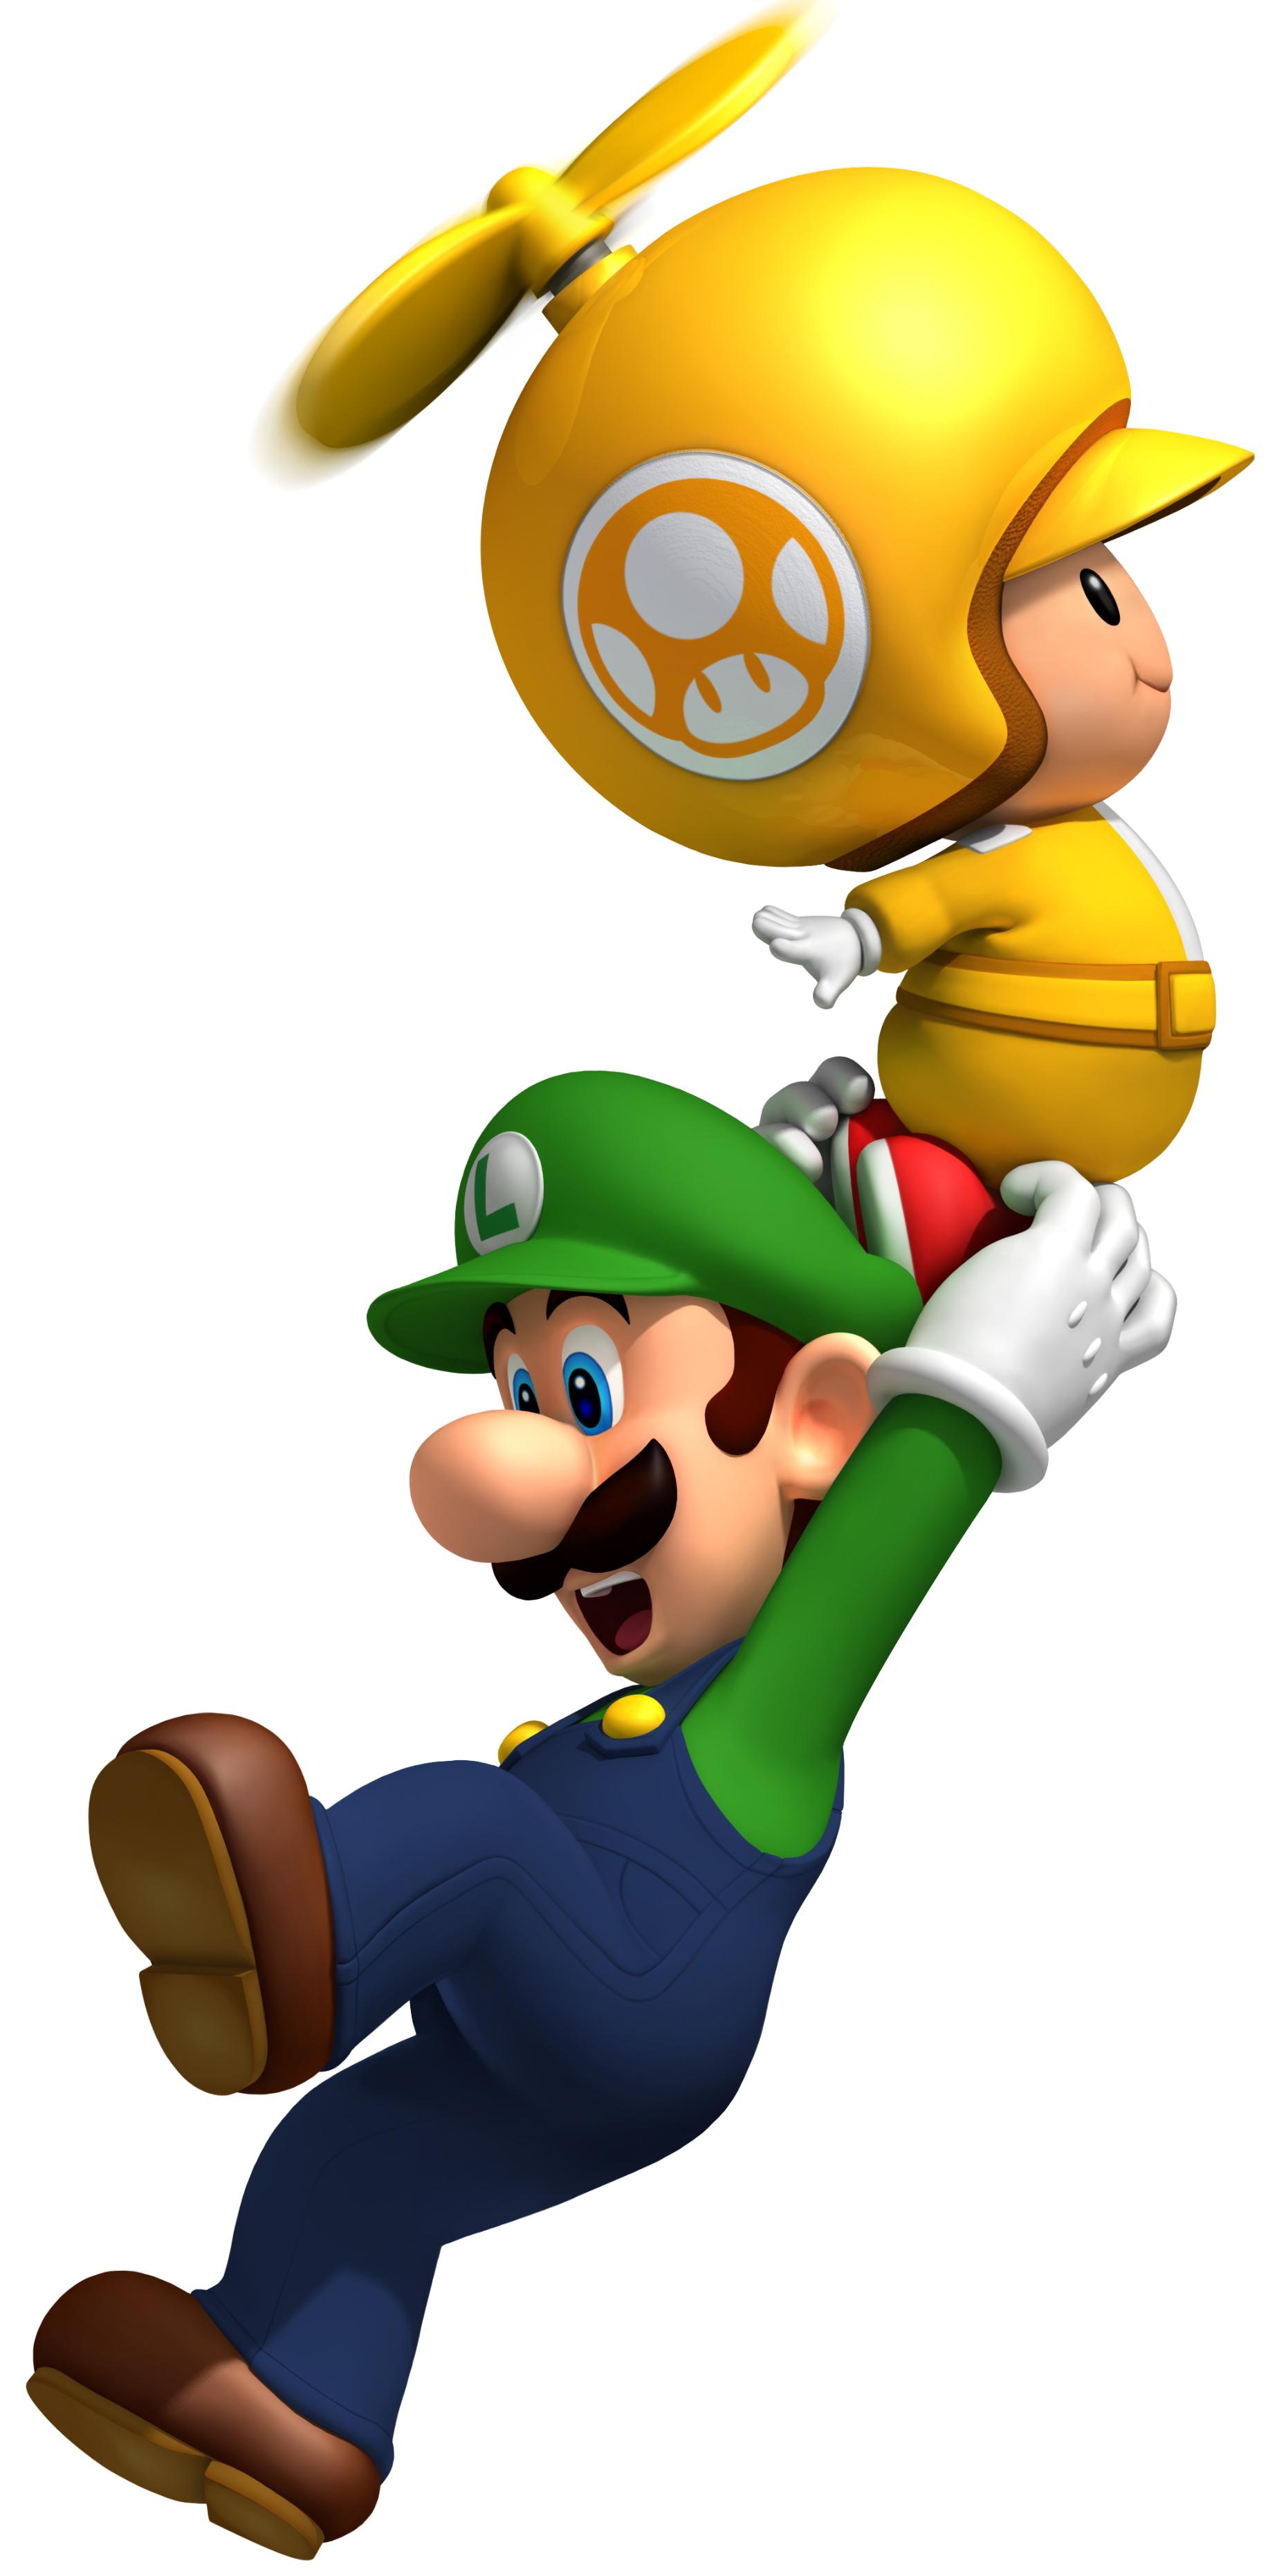 Mario clipart new super mario bro Artwork Mario Image  Super